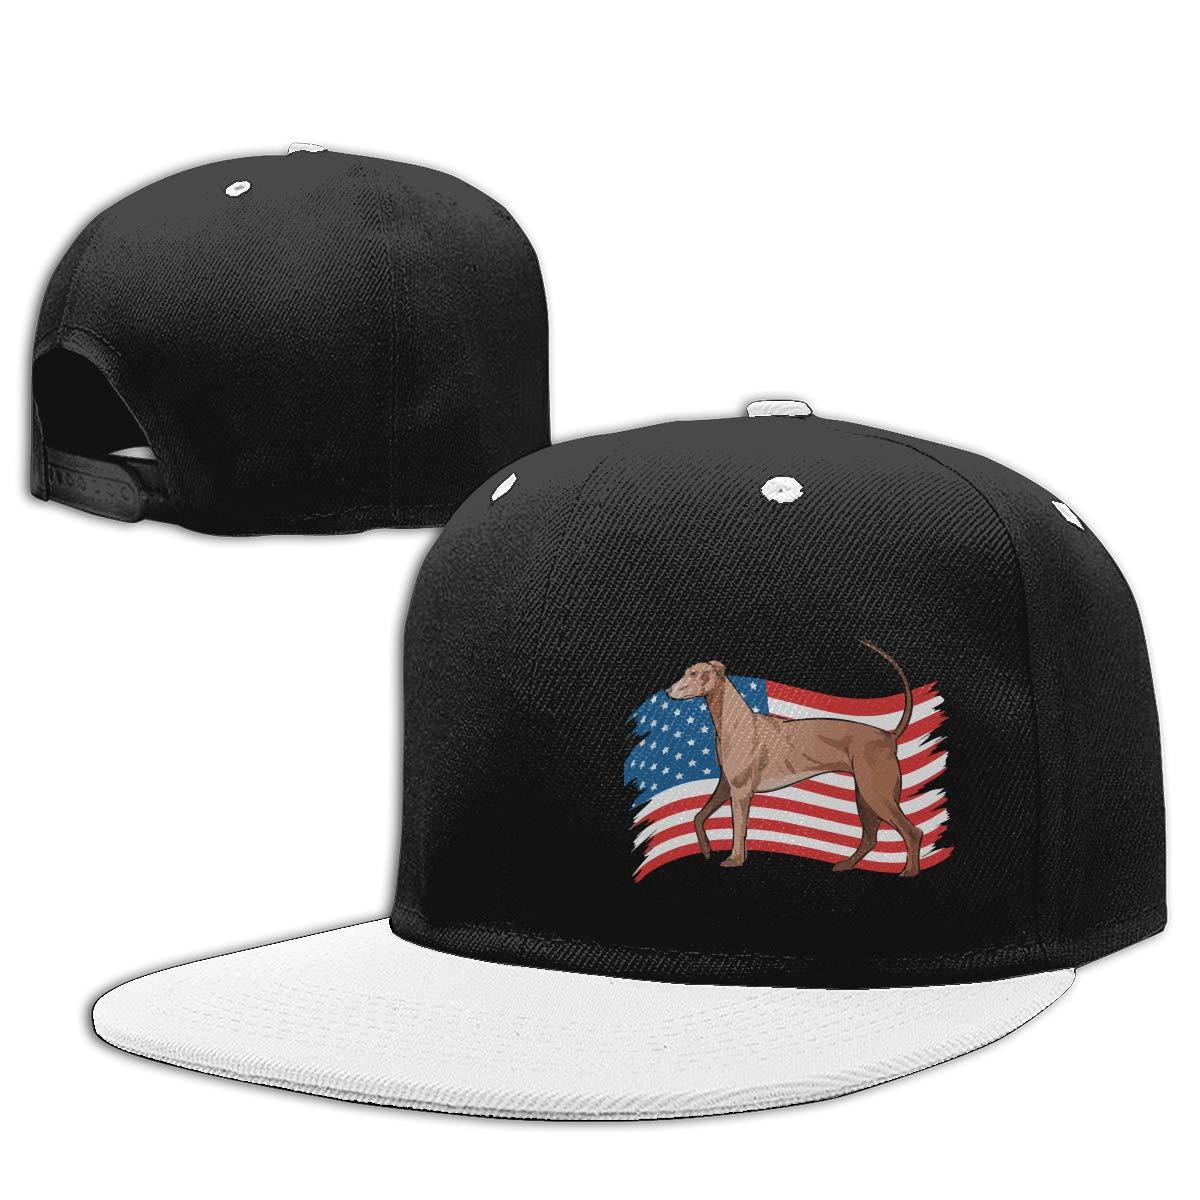 NMG-01 Women Men Plain Cap Redbone Coonhound Dog USA Flag Adults Hip-Hop Baseball Caps